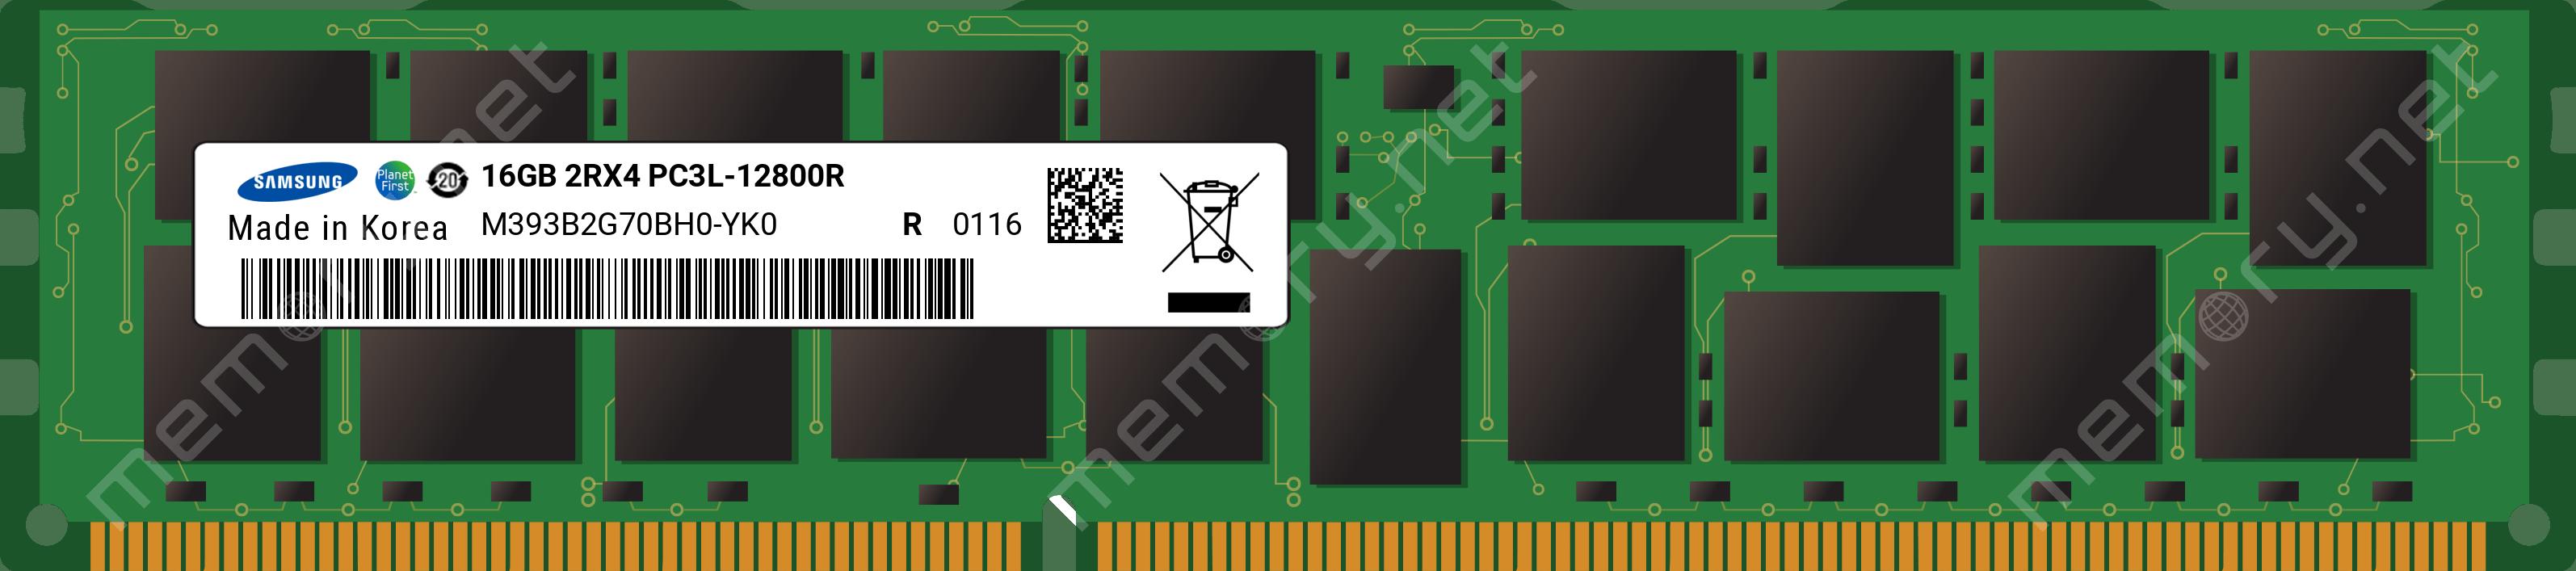 Bộ Nhớ RAM DDR3-1600 16GB ECC/REG Samsung Chip Server Memory